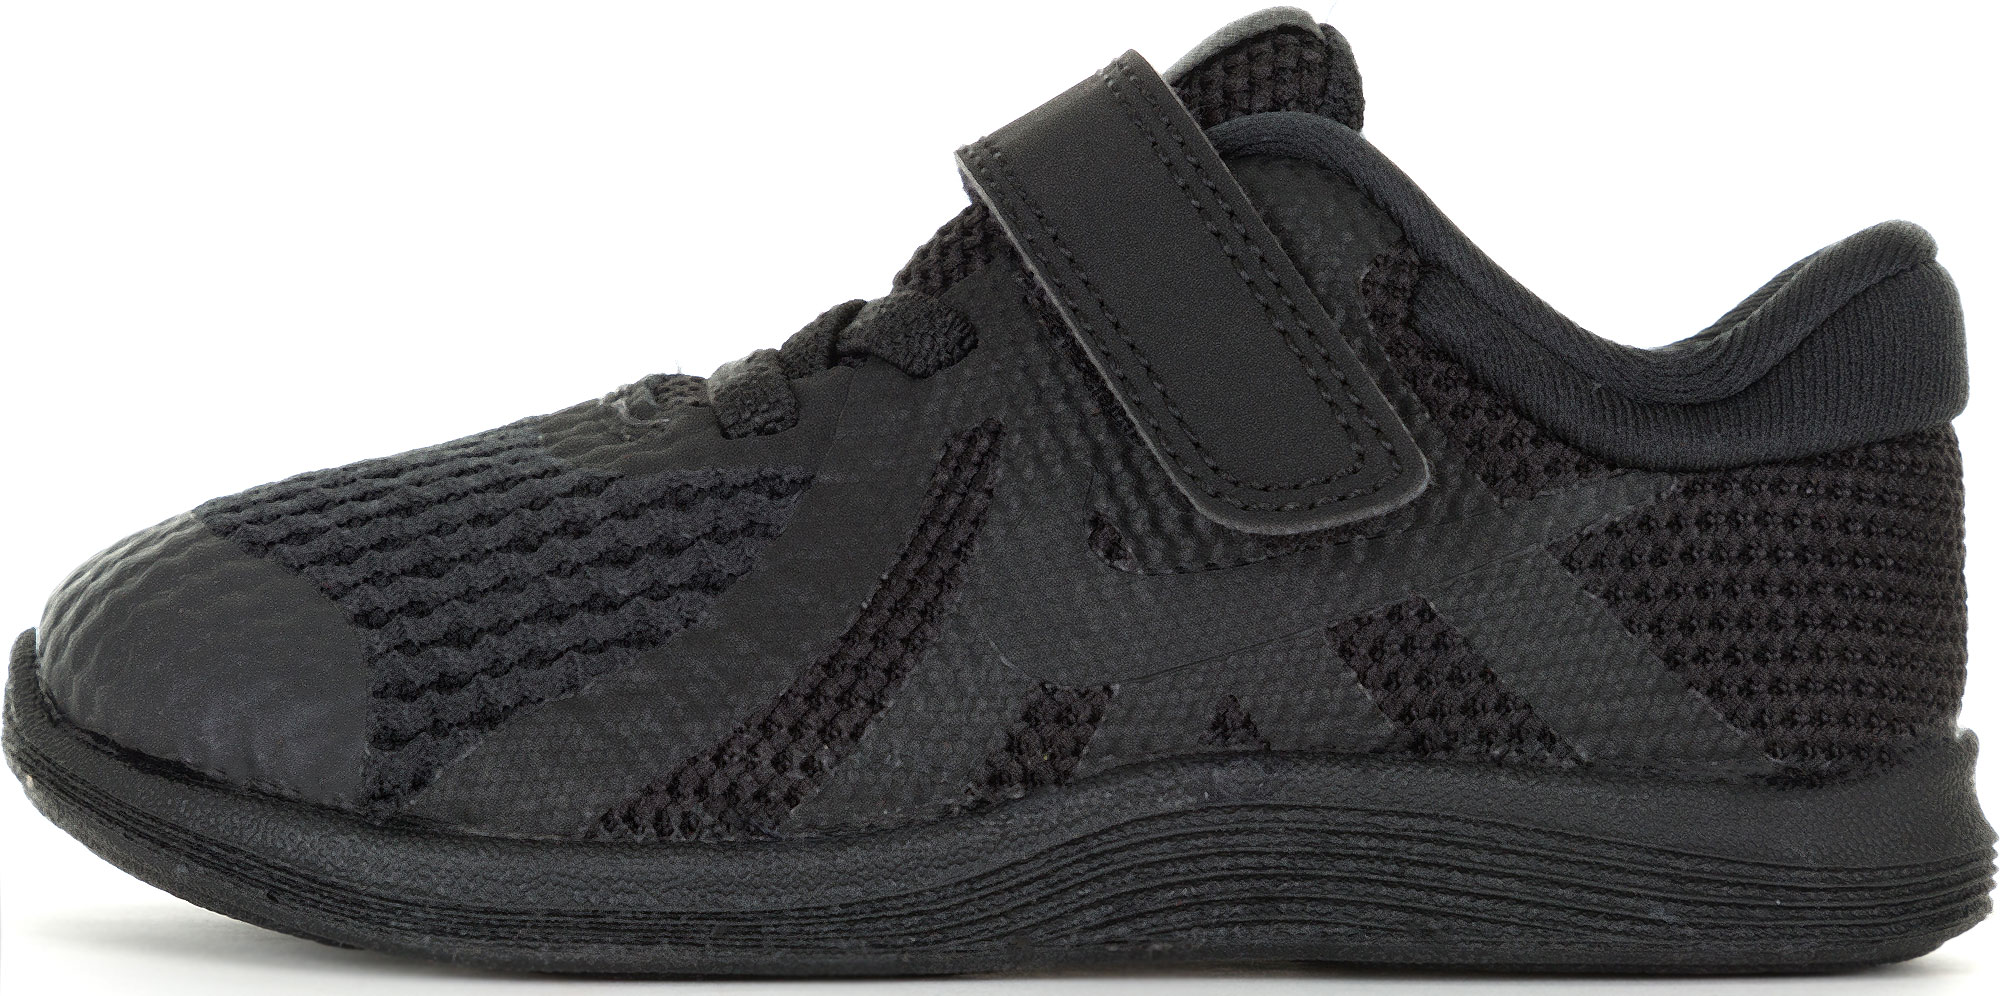 Nike Кроссовки для мальчиков Nike Revolution 4, размер 26